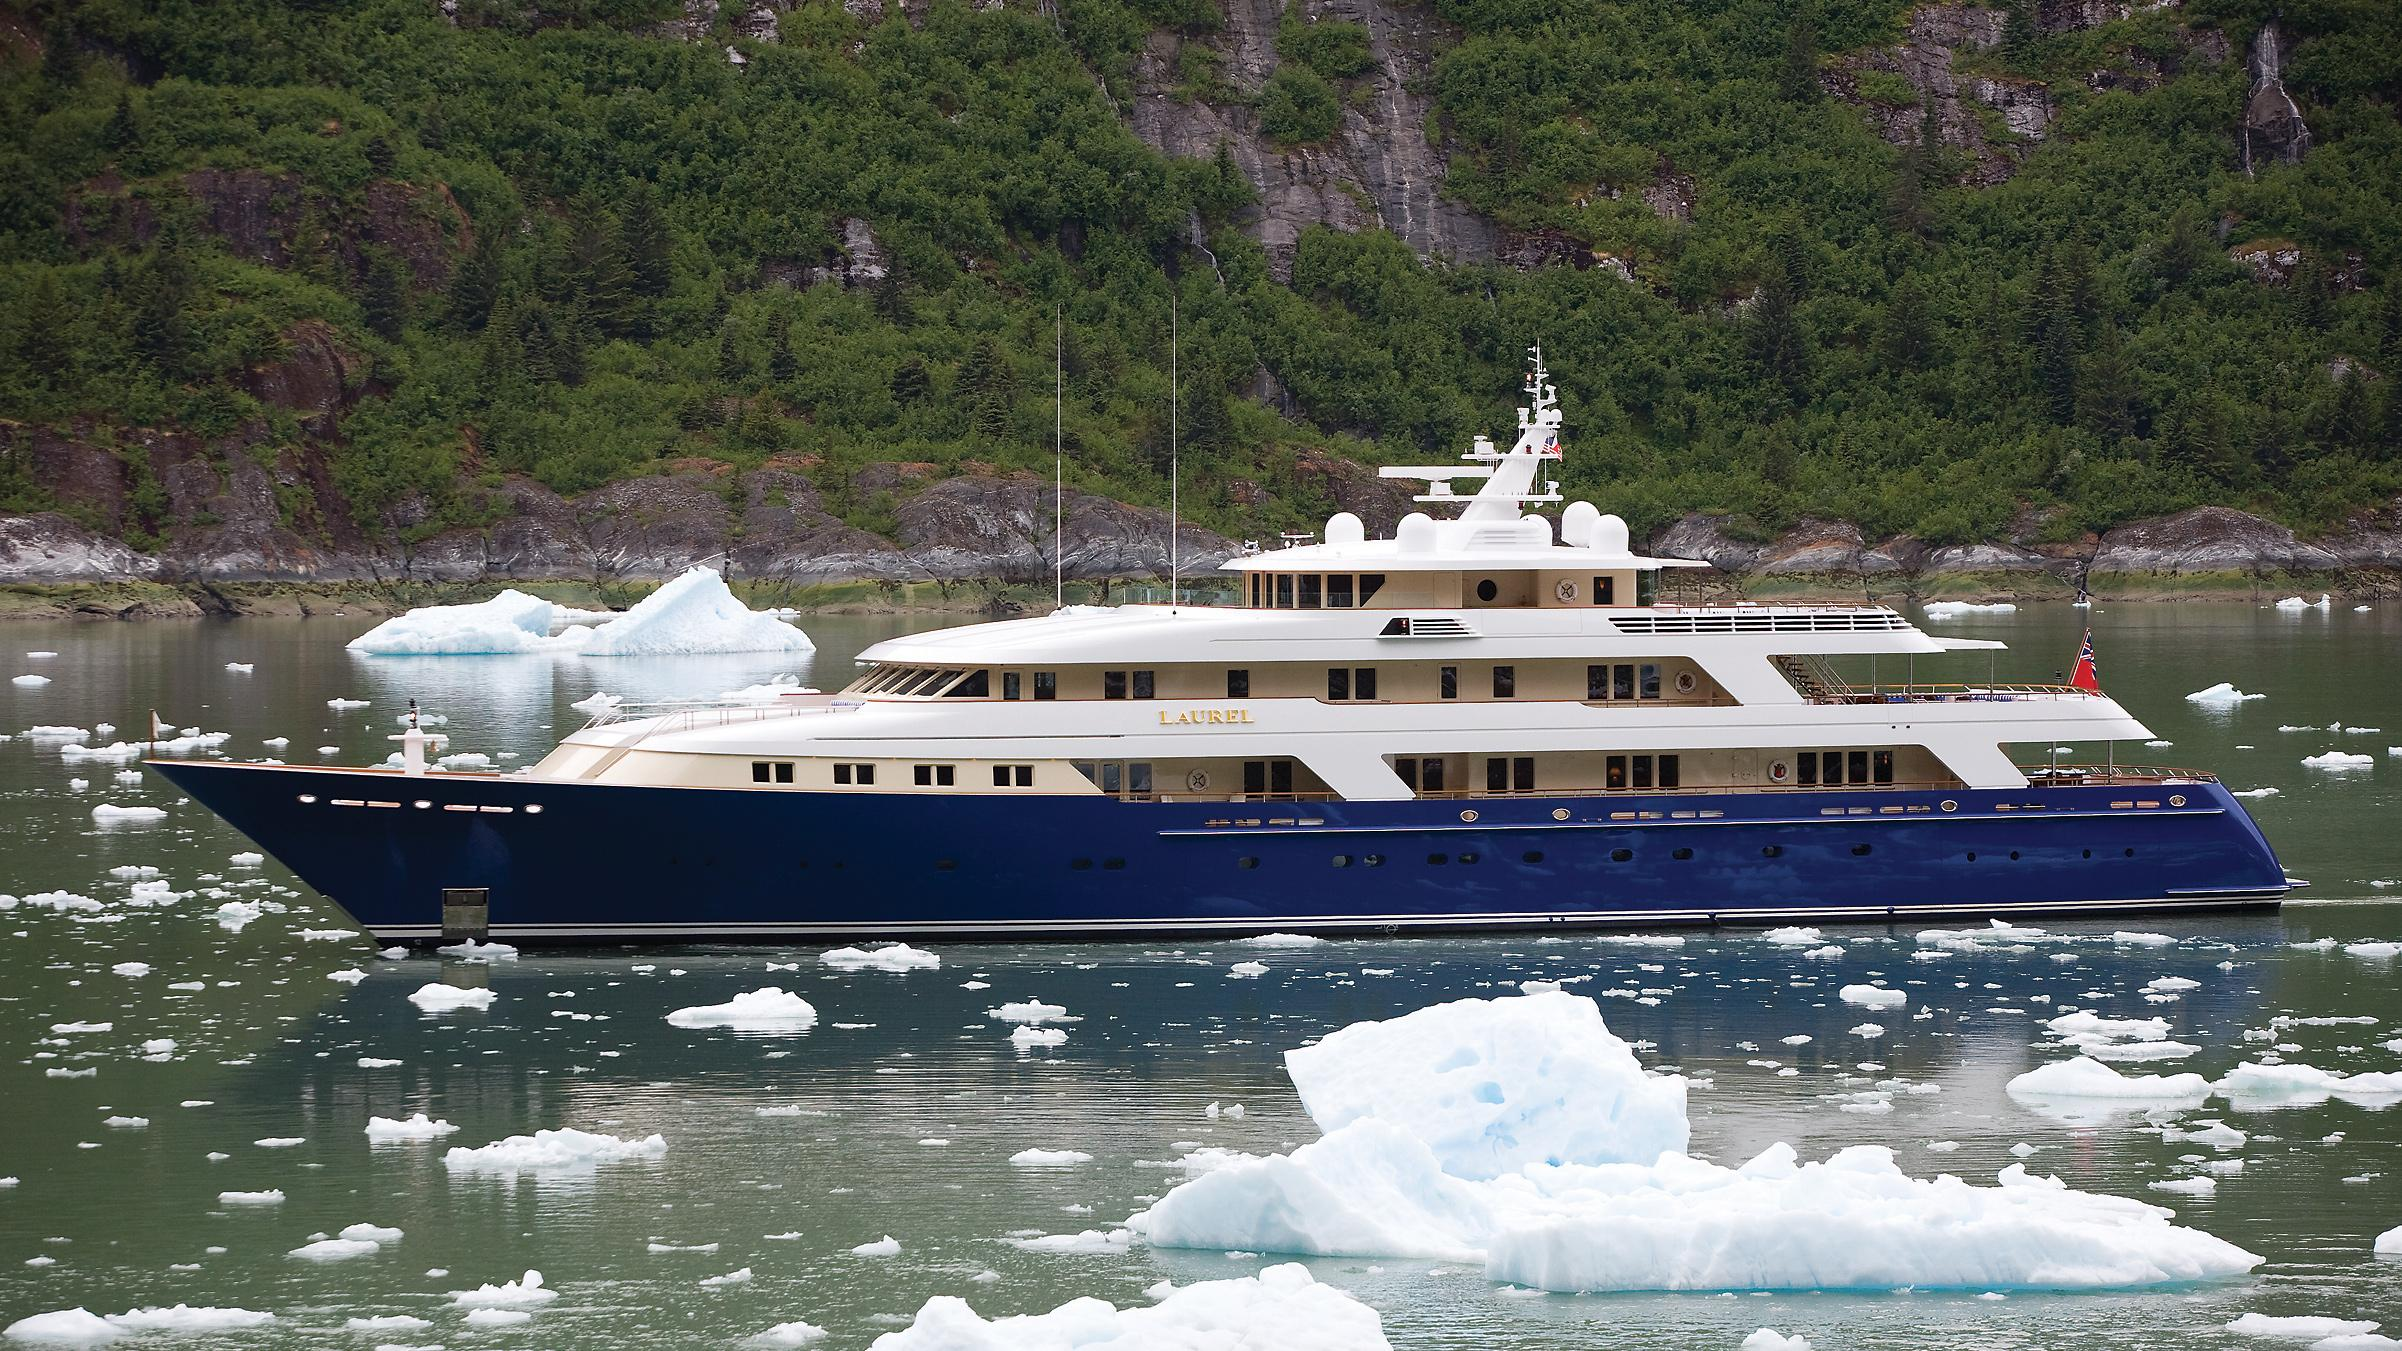 laurel-motor-yacht-delta-marine-2006-73m-profile-iceberg